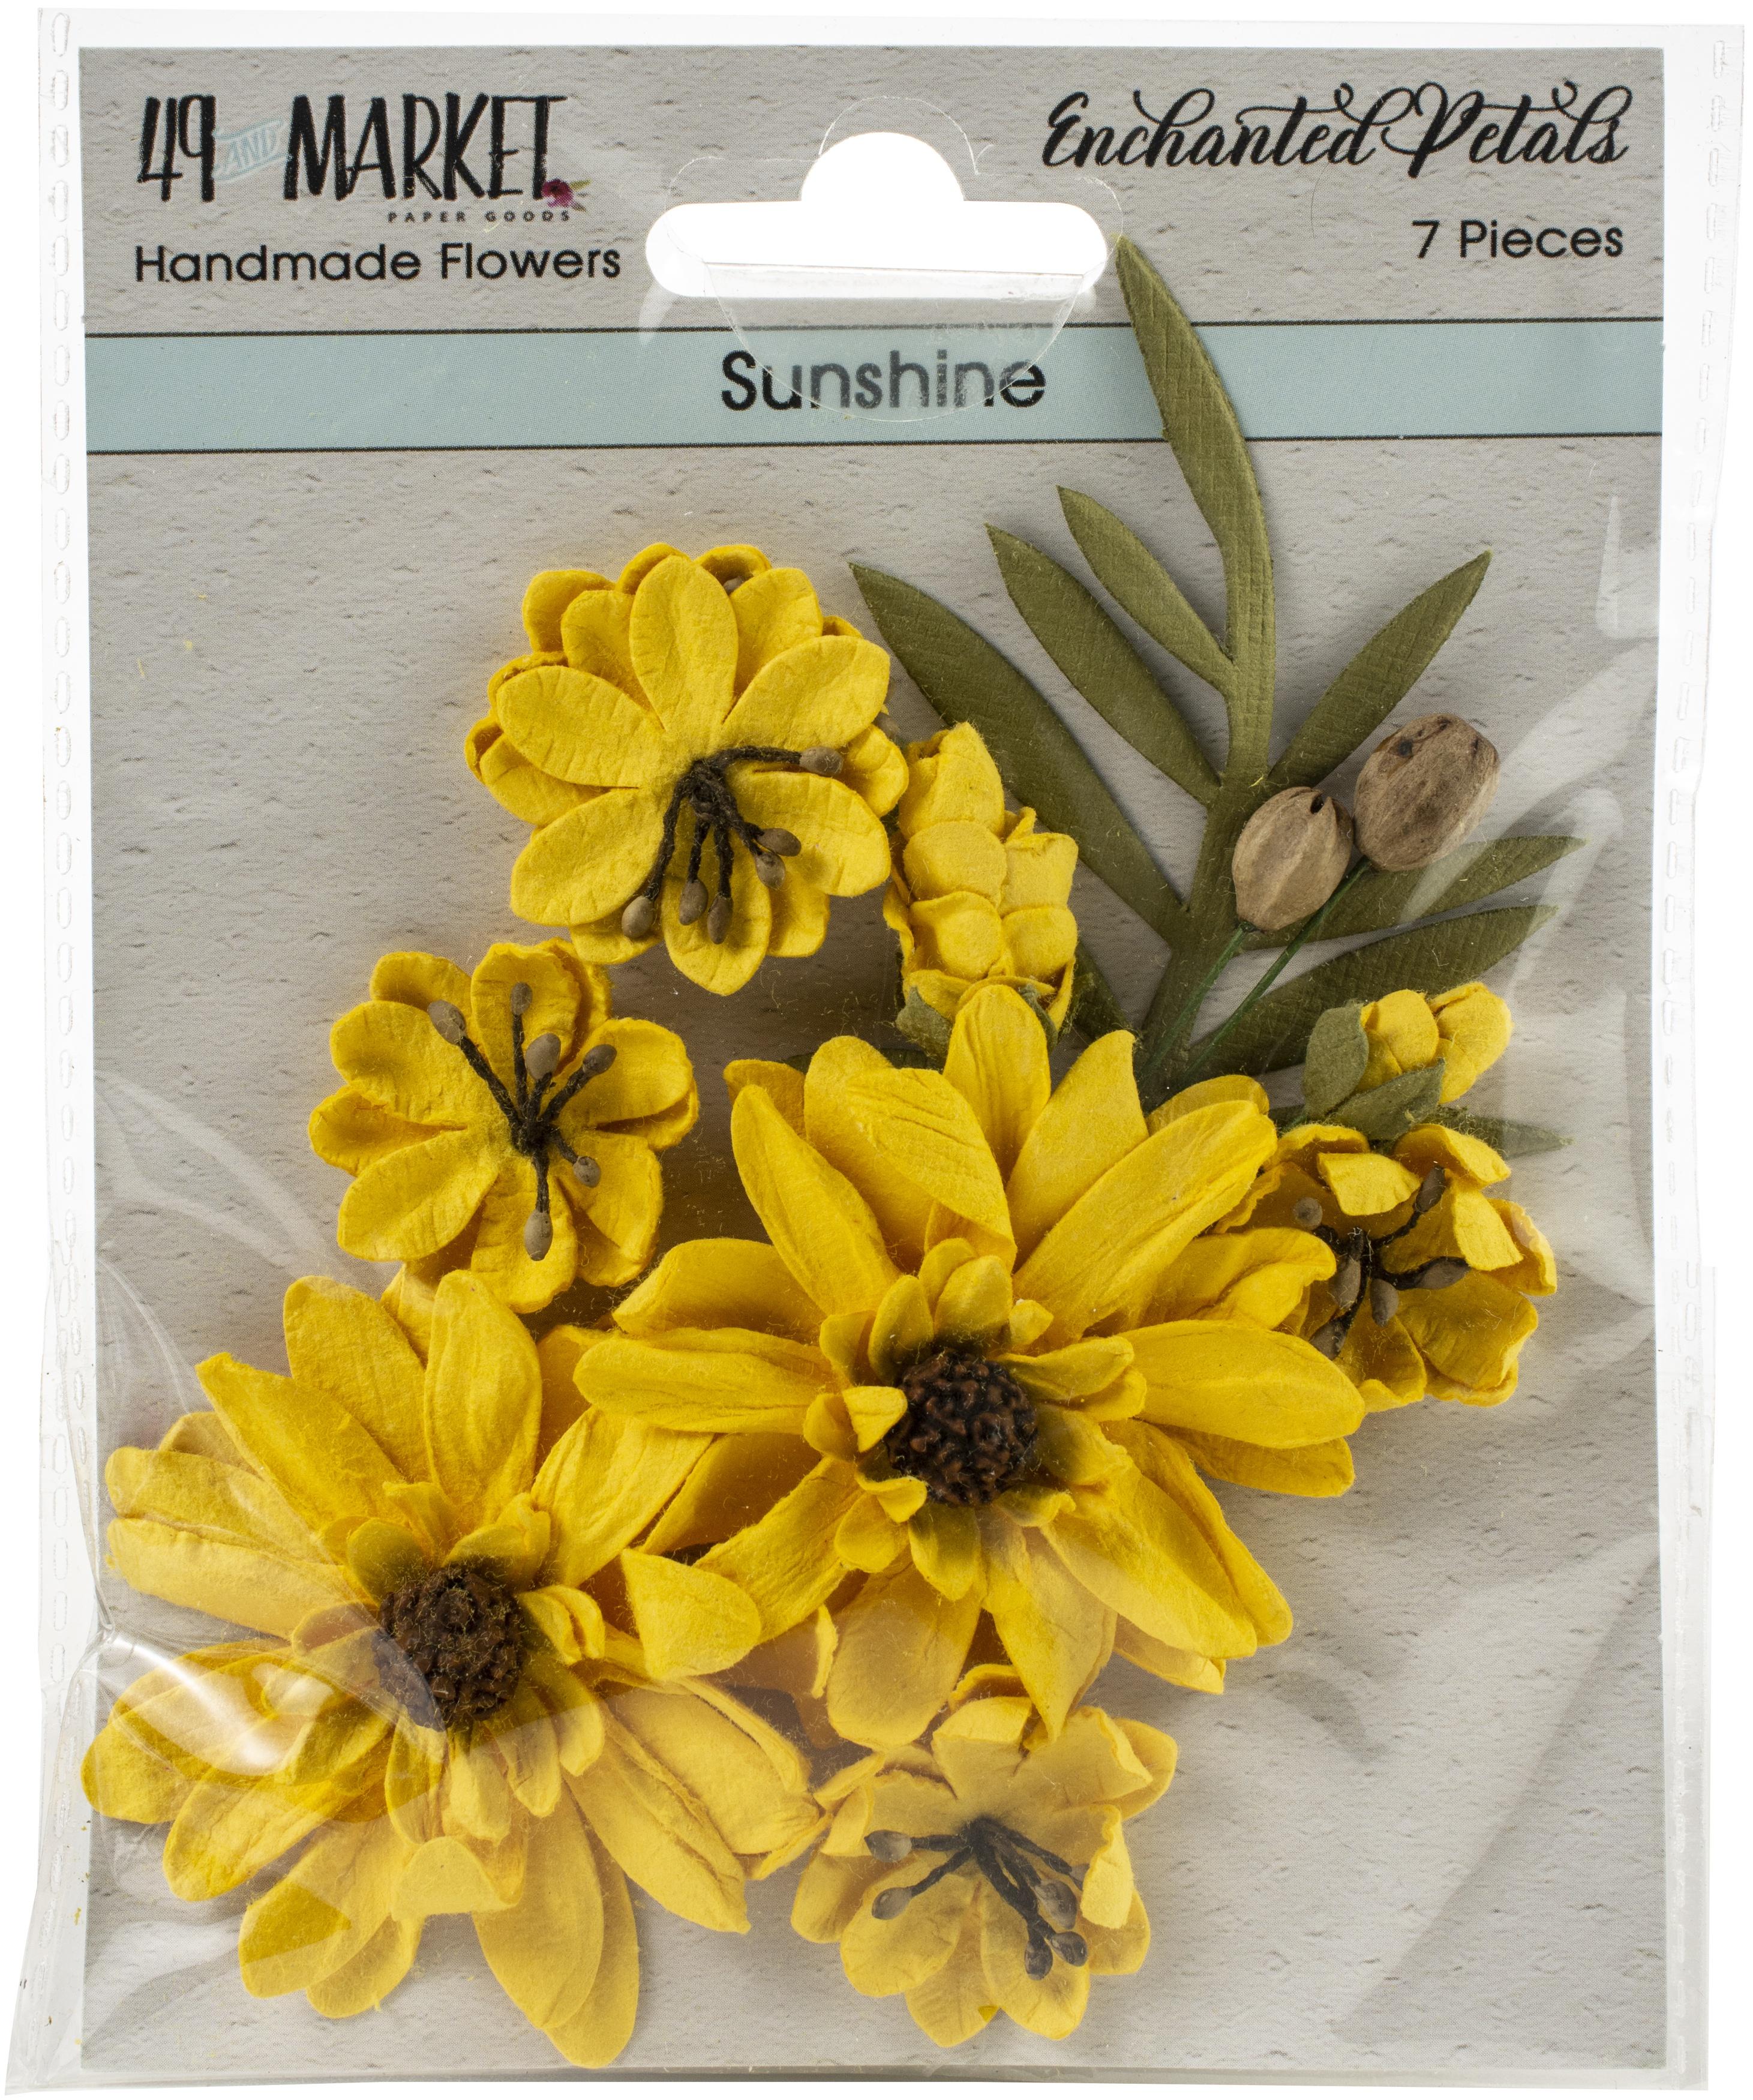 49 And Market Enchanted Petals - Sunshine